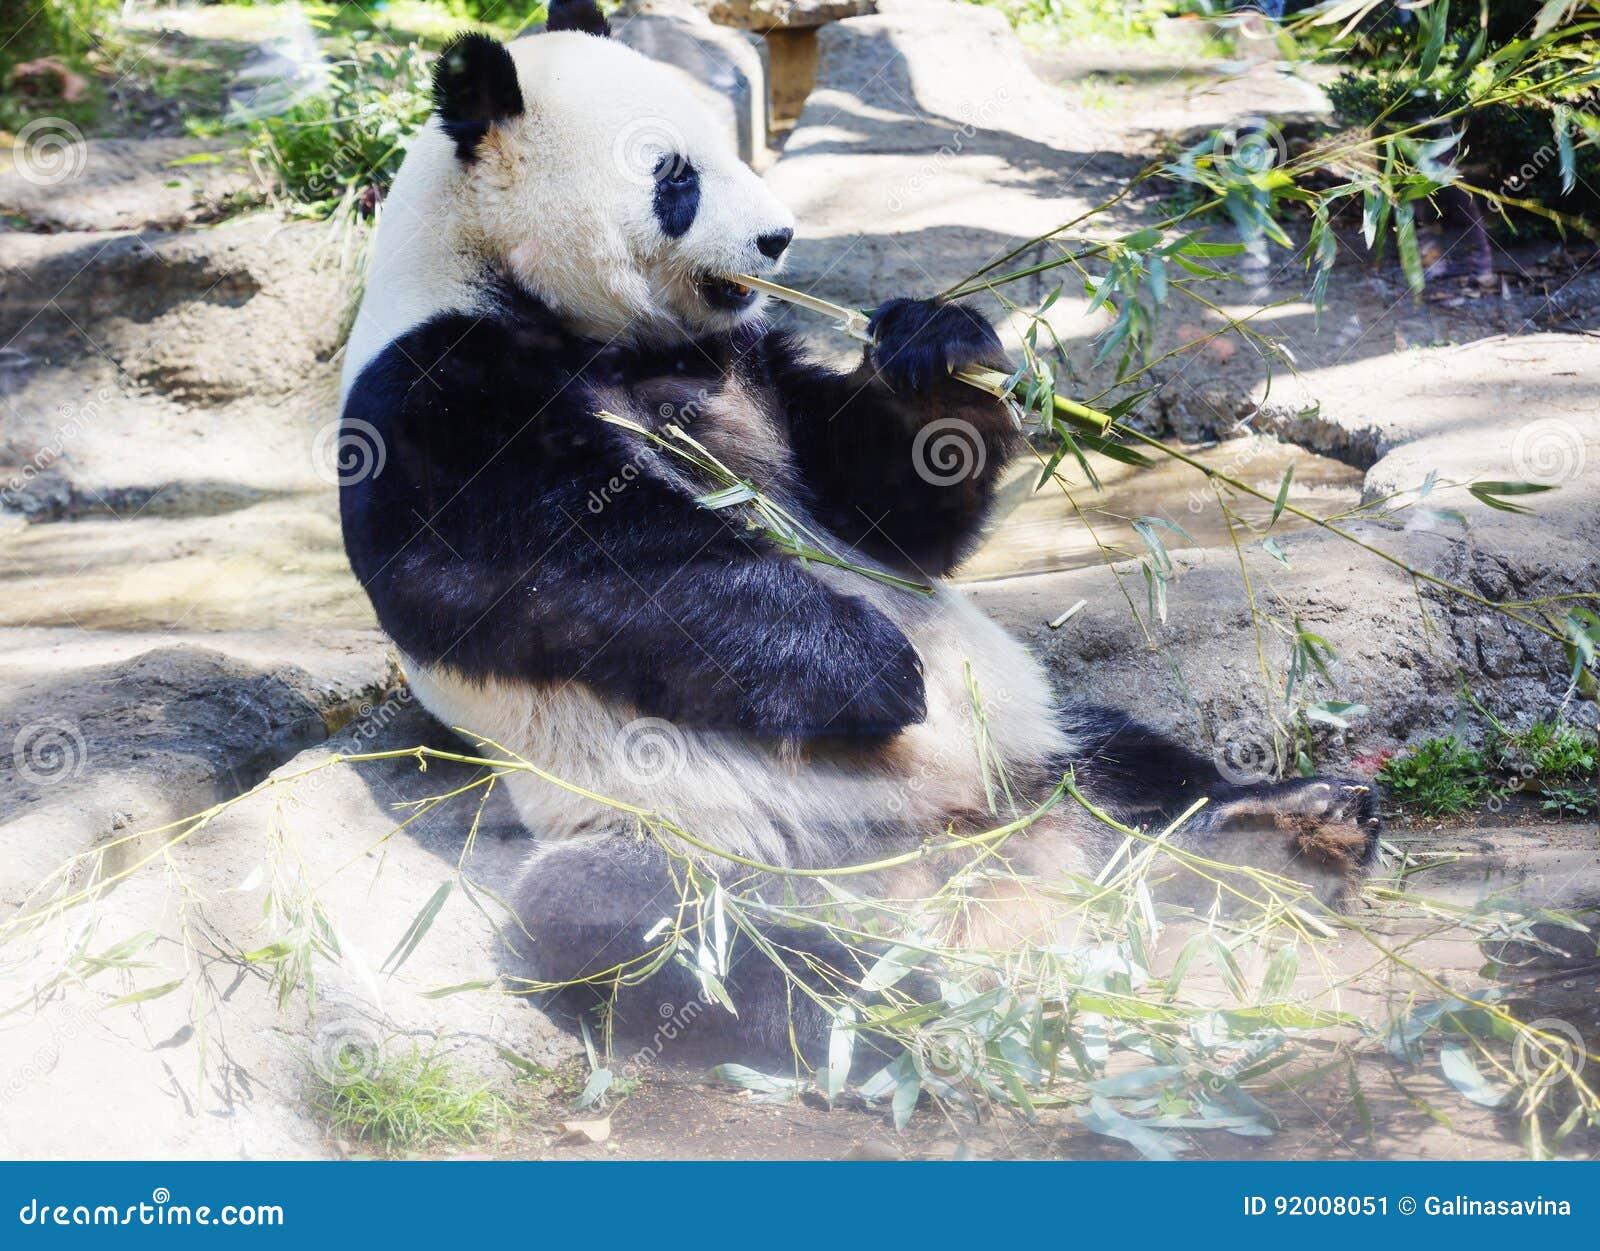 Big Panda, or Bamboo Bear: a description of where interesting facts live 37